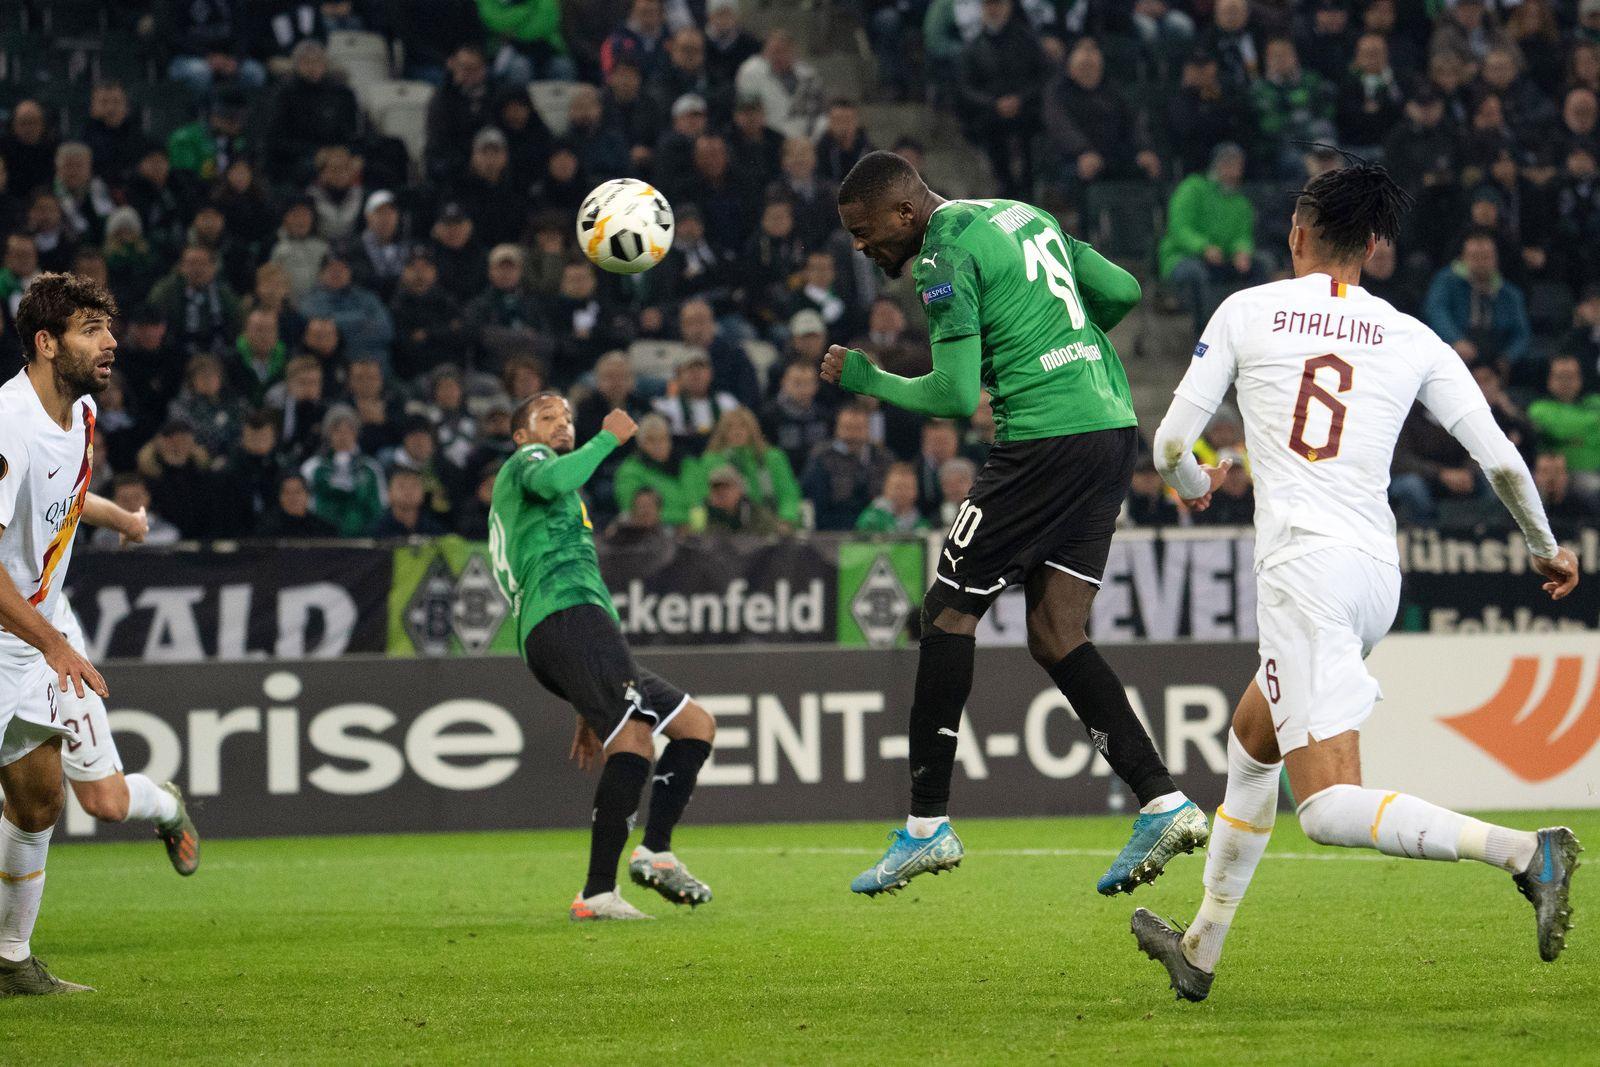 Borussia Mönchengladbach - AS Rom